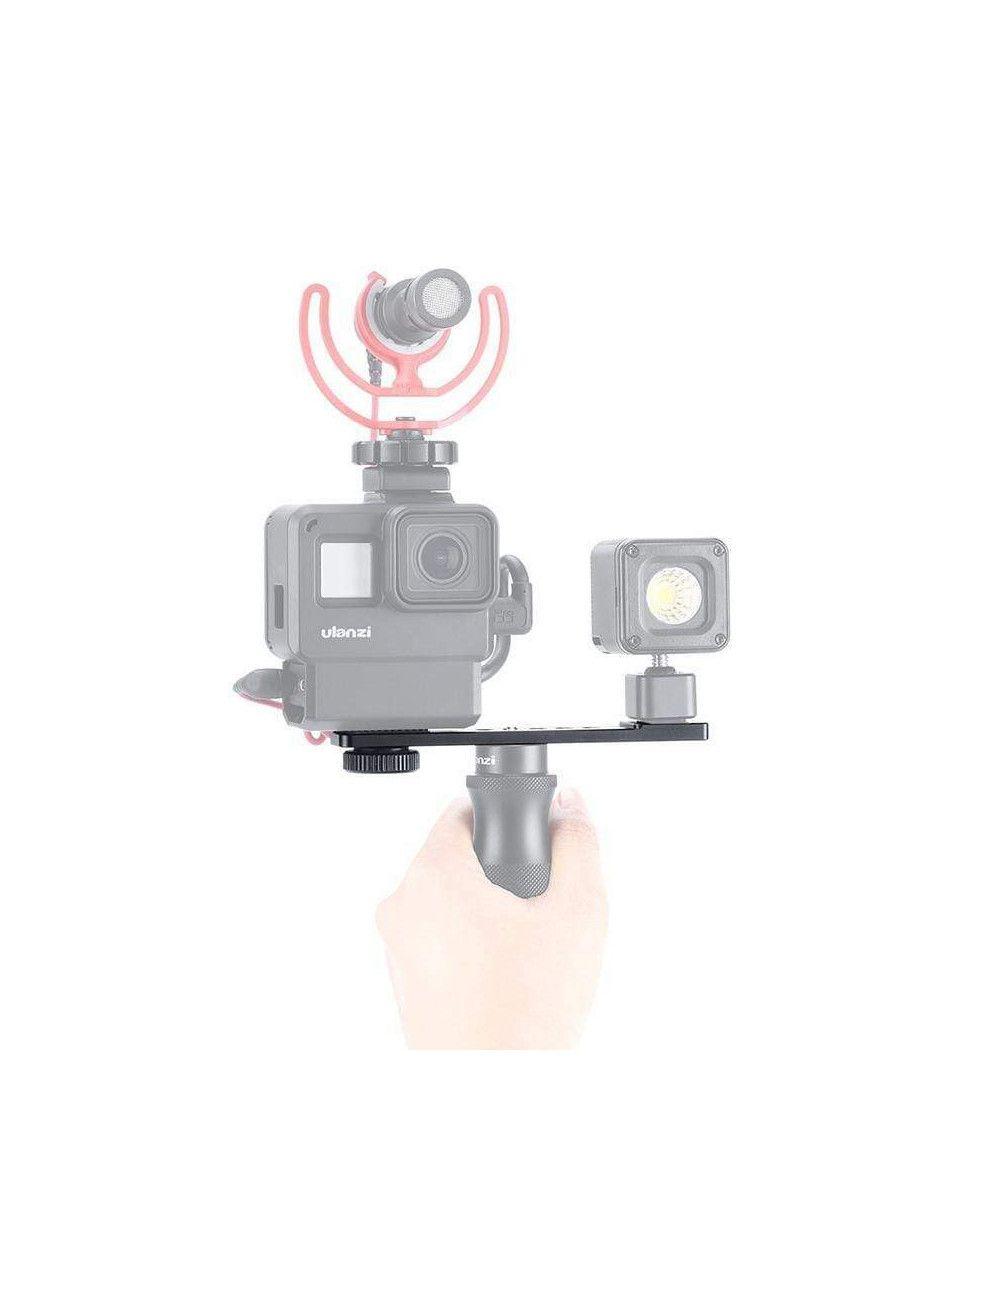 Flash Yongnuo YN720 con batería recargable de Litio para Canon Nikon Sony Pentax y Panasonic